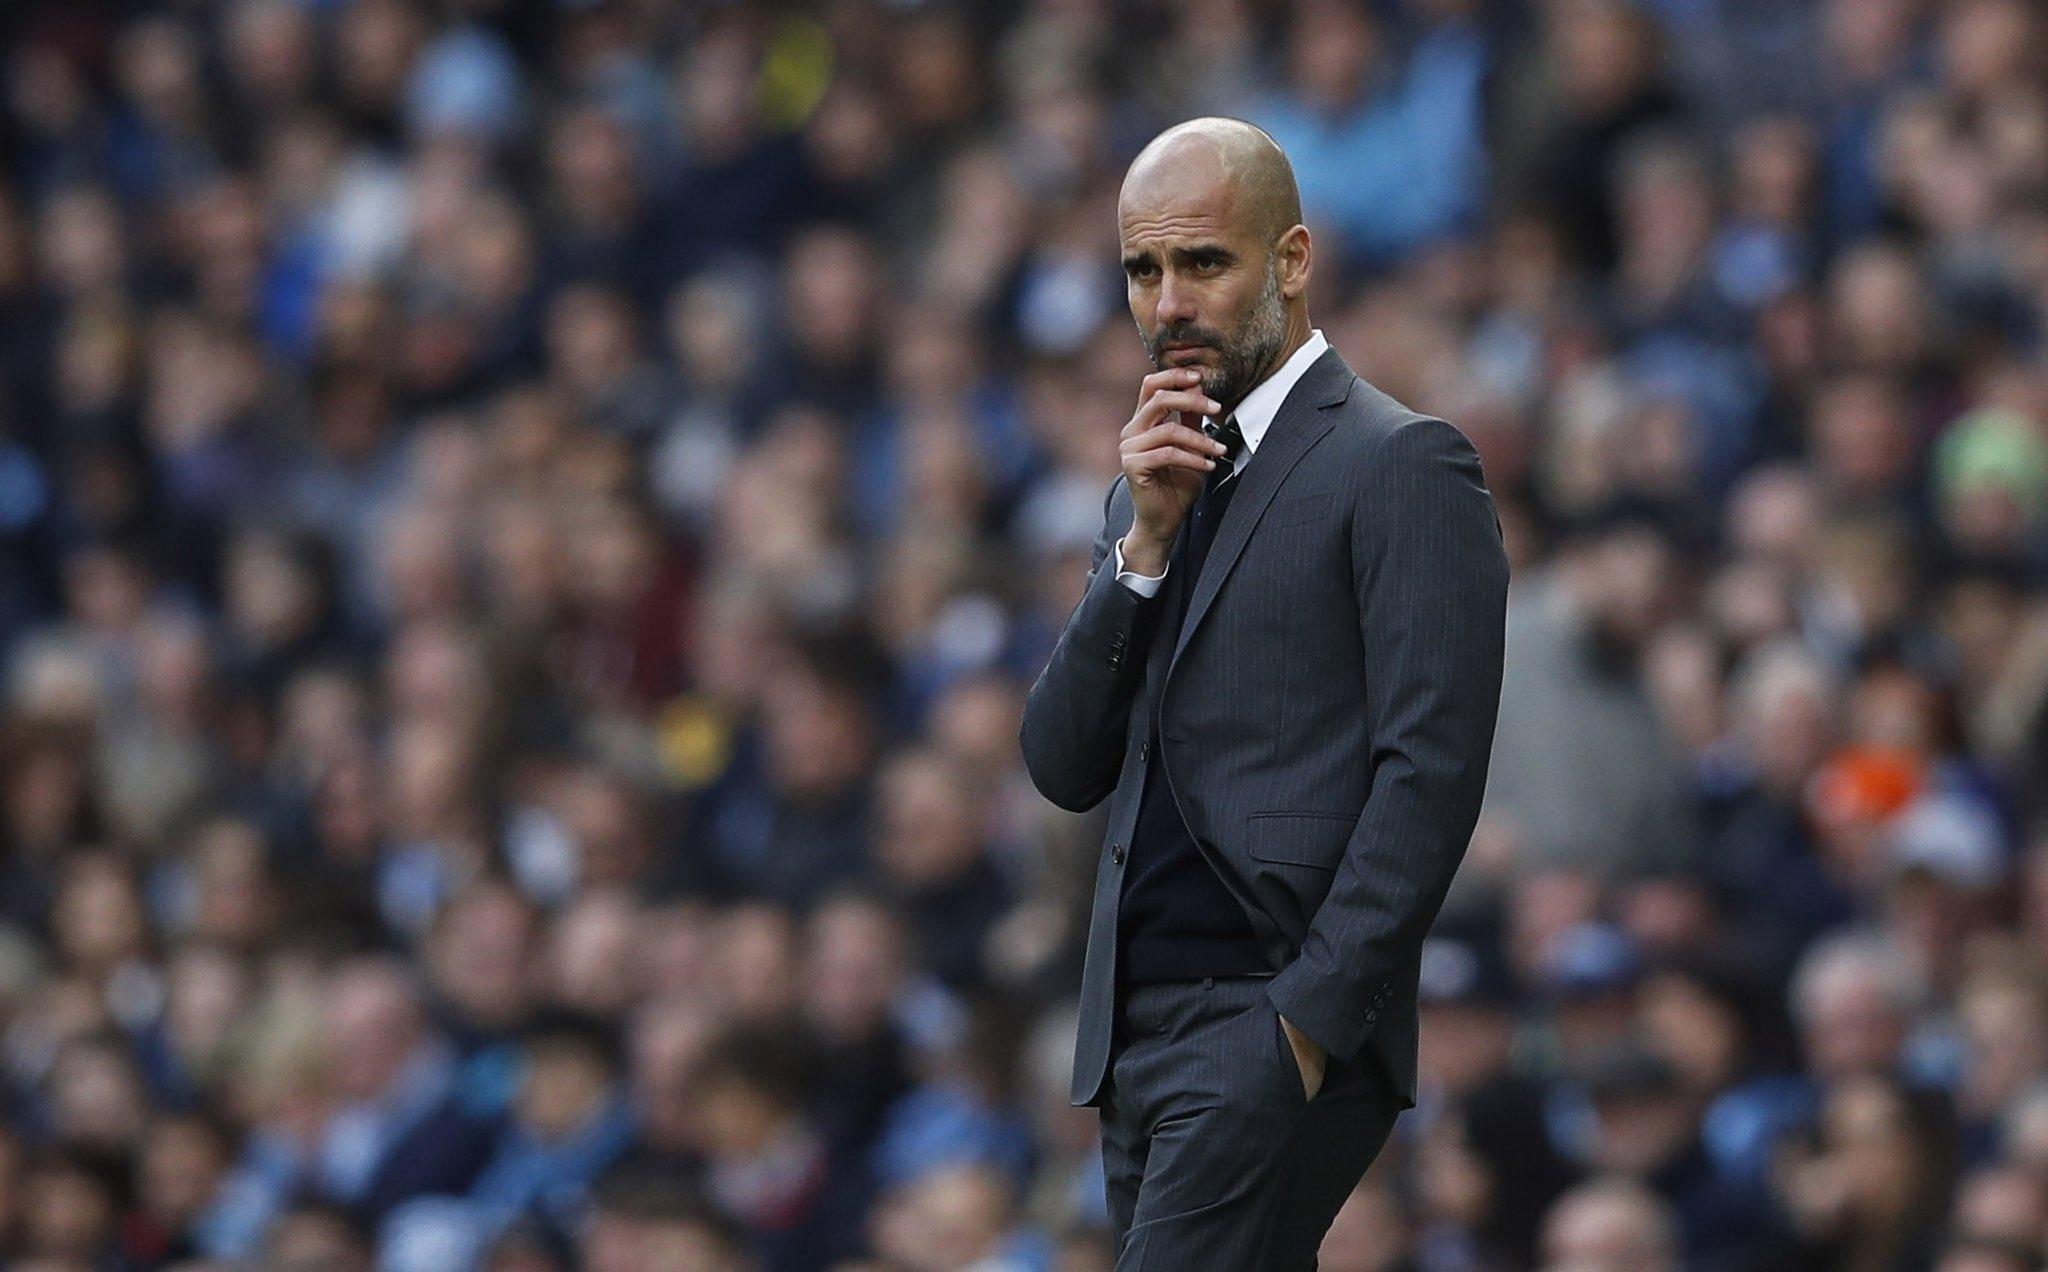 Guardiola Silent On Iheanacho, Other City Stars' Future; Focuses On Watford 'Final'